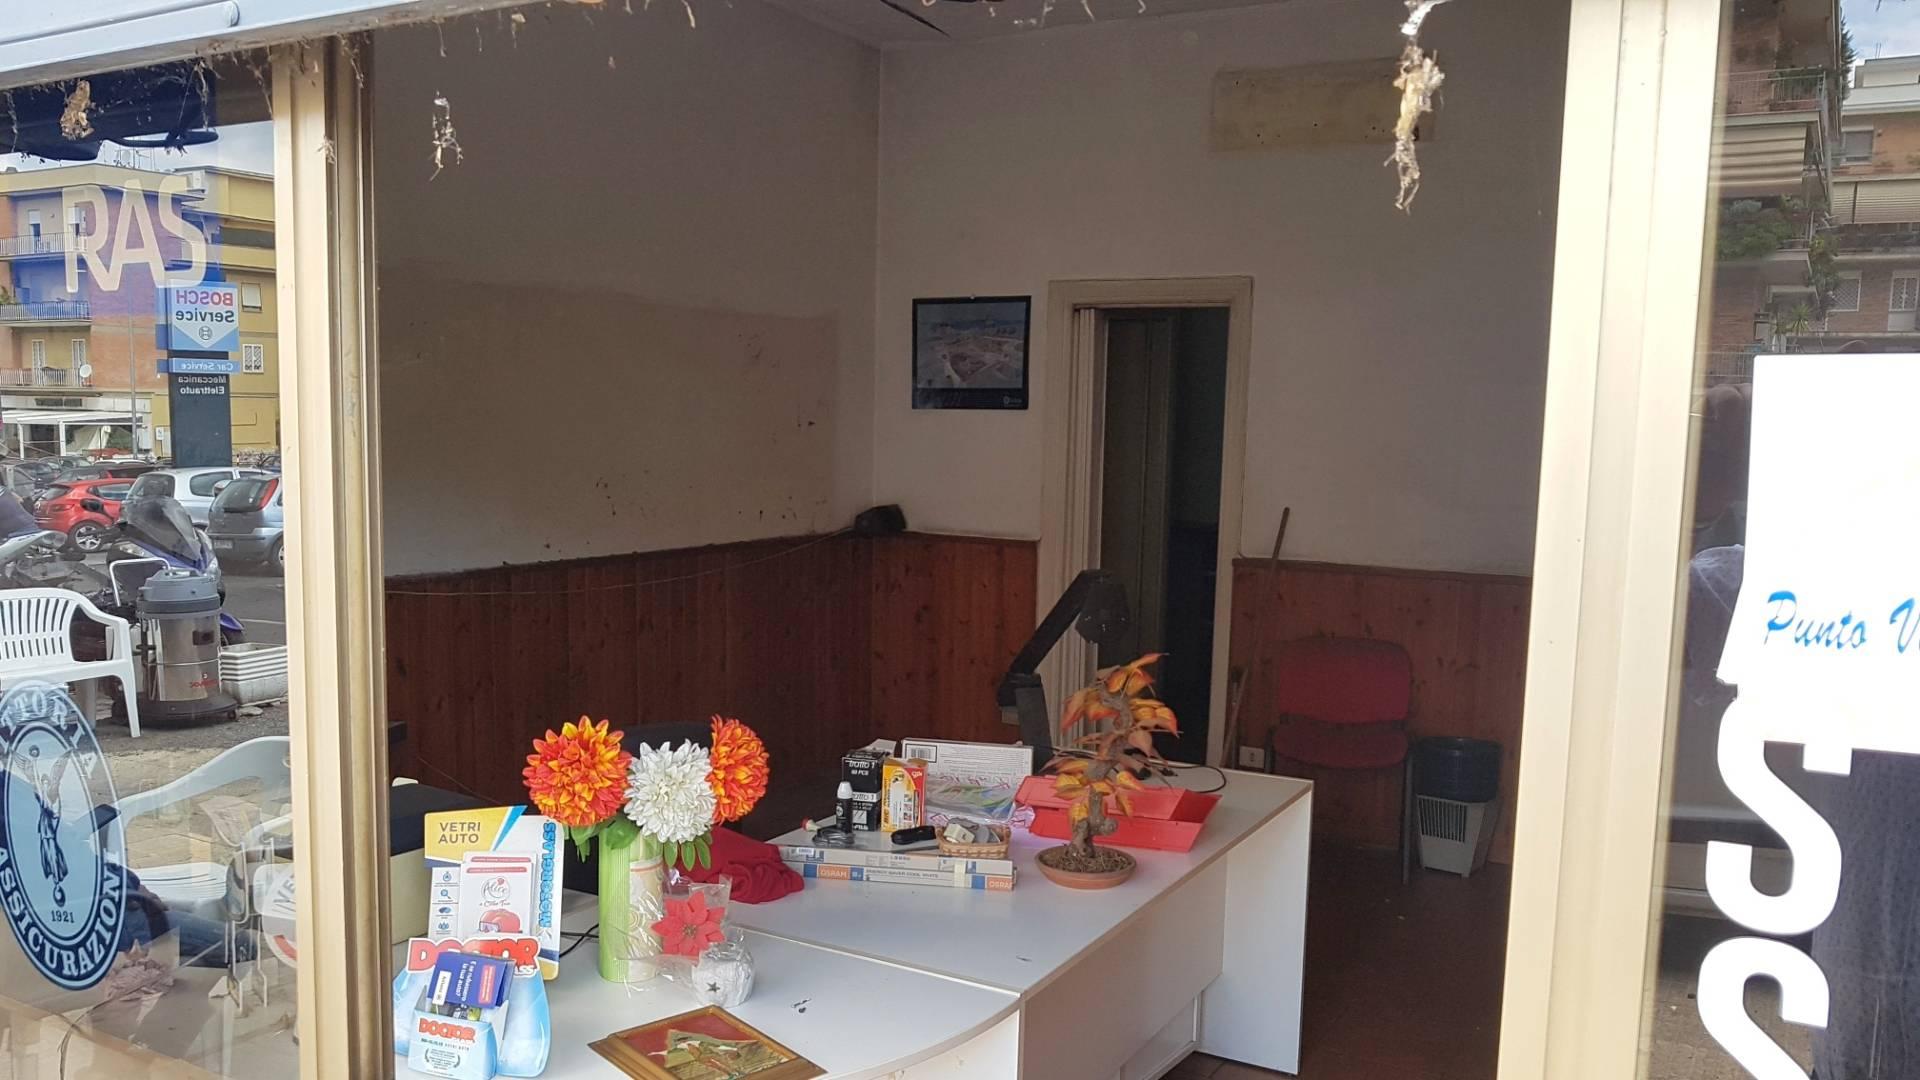 Cbi053 portuensec1 loc locale commerciale in affitto a for Affitto locale commerciale a roma